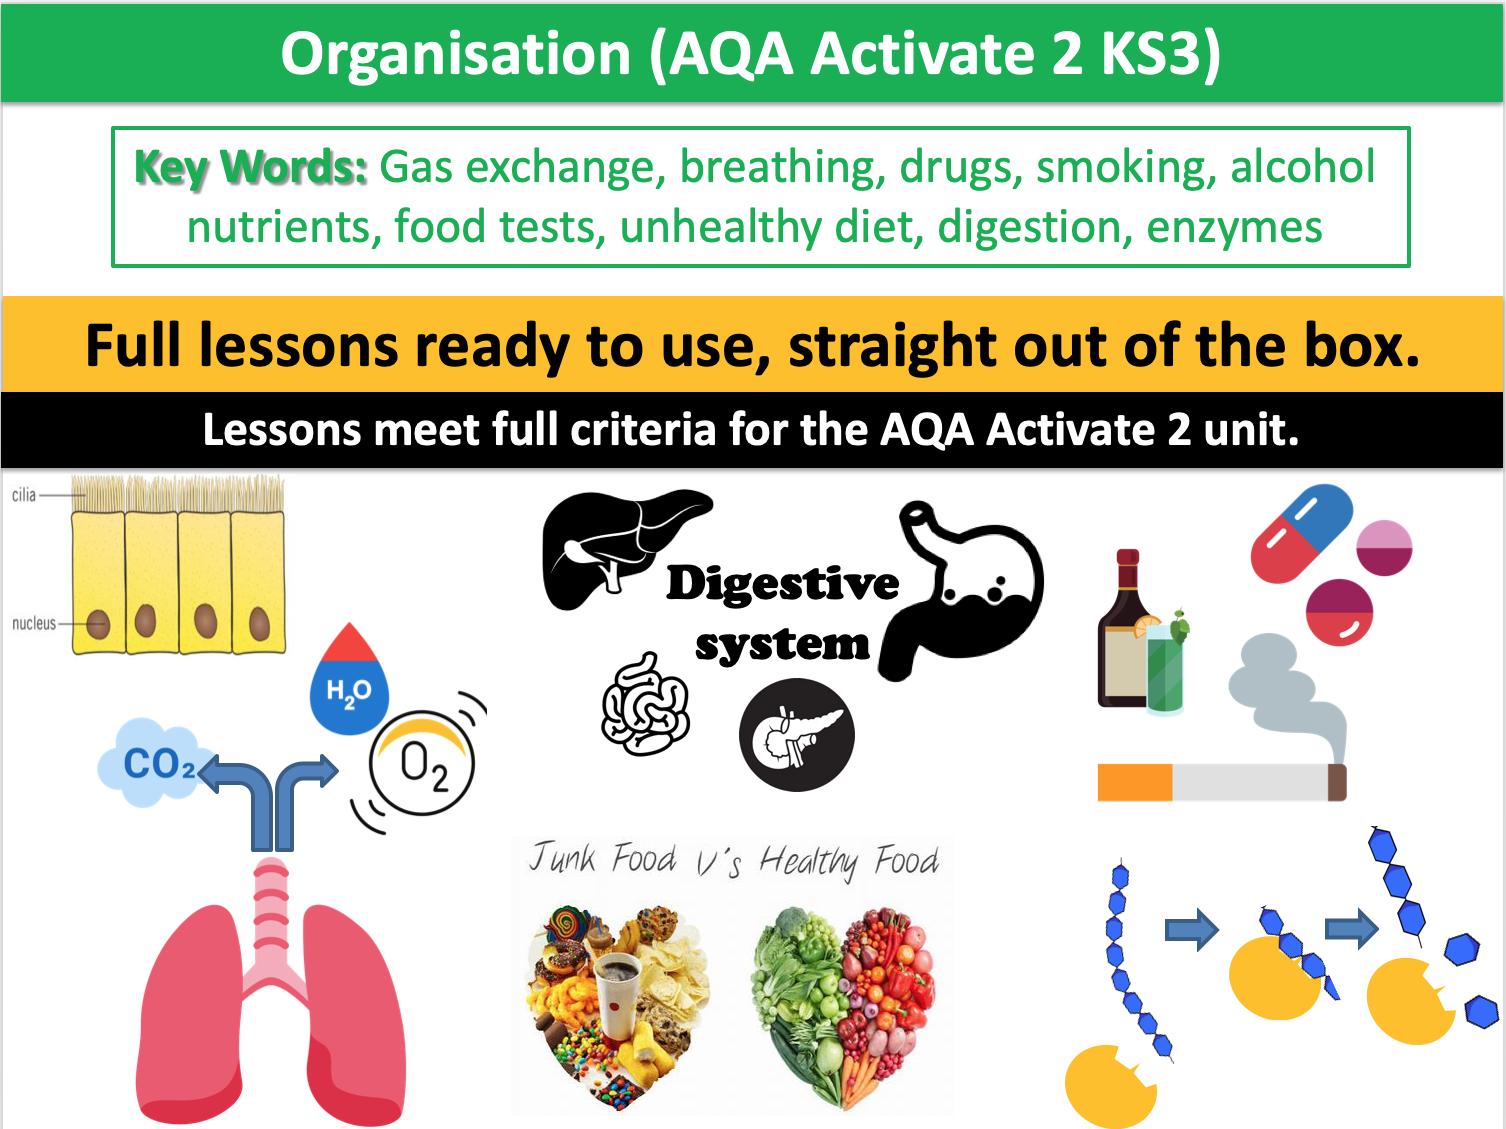 Organisation (AQA Activate 2 KS3)